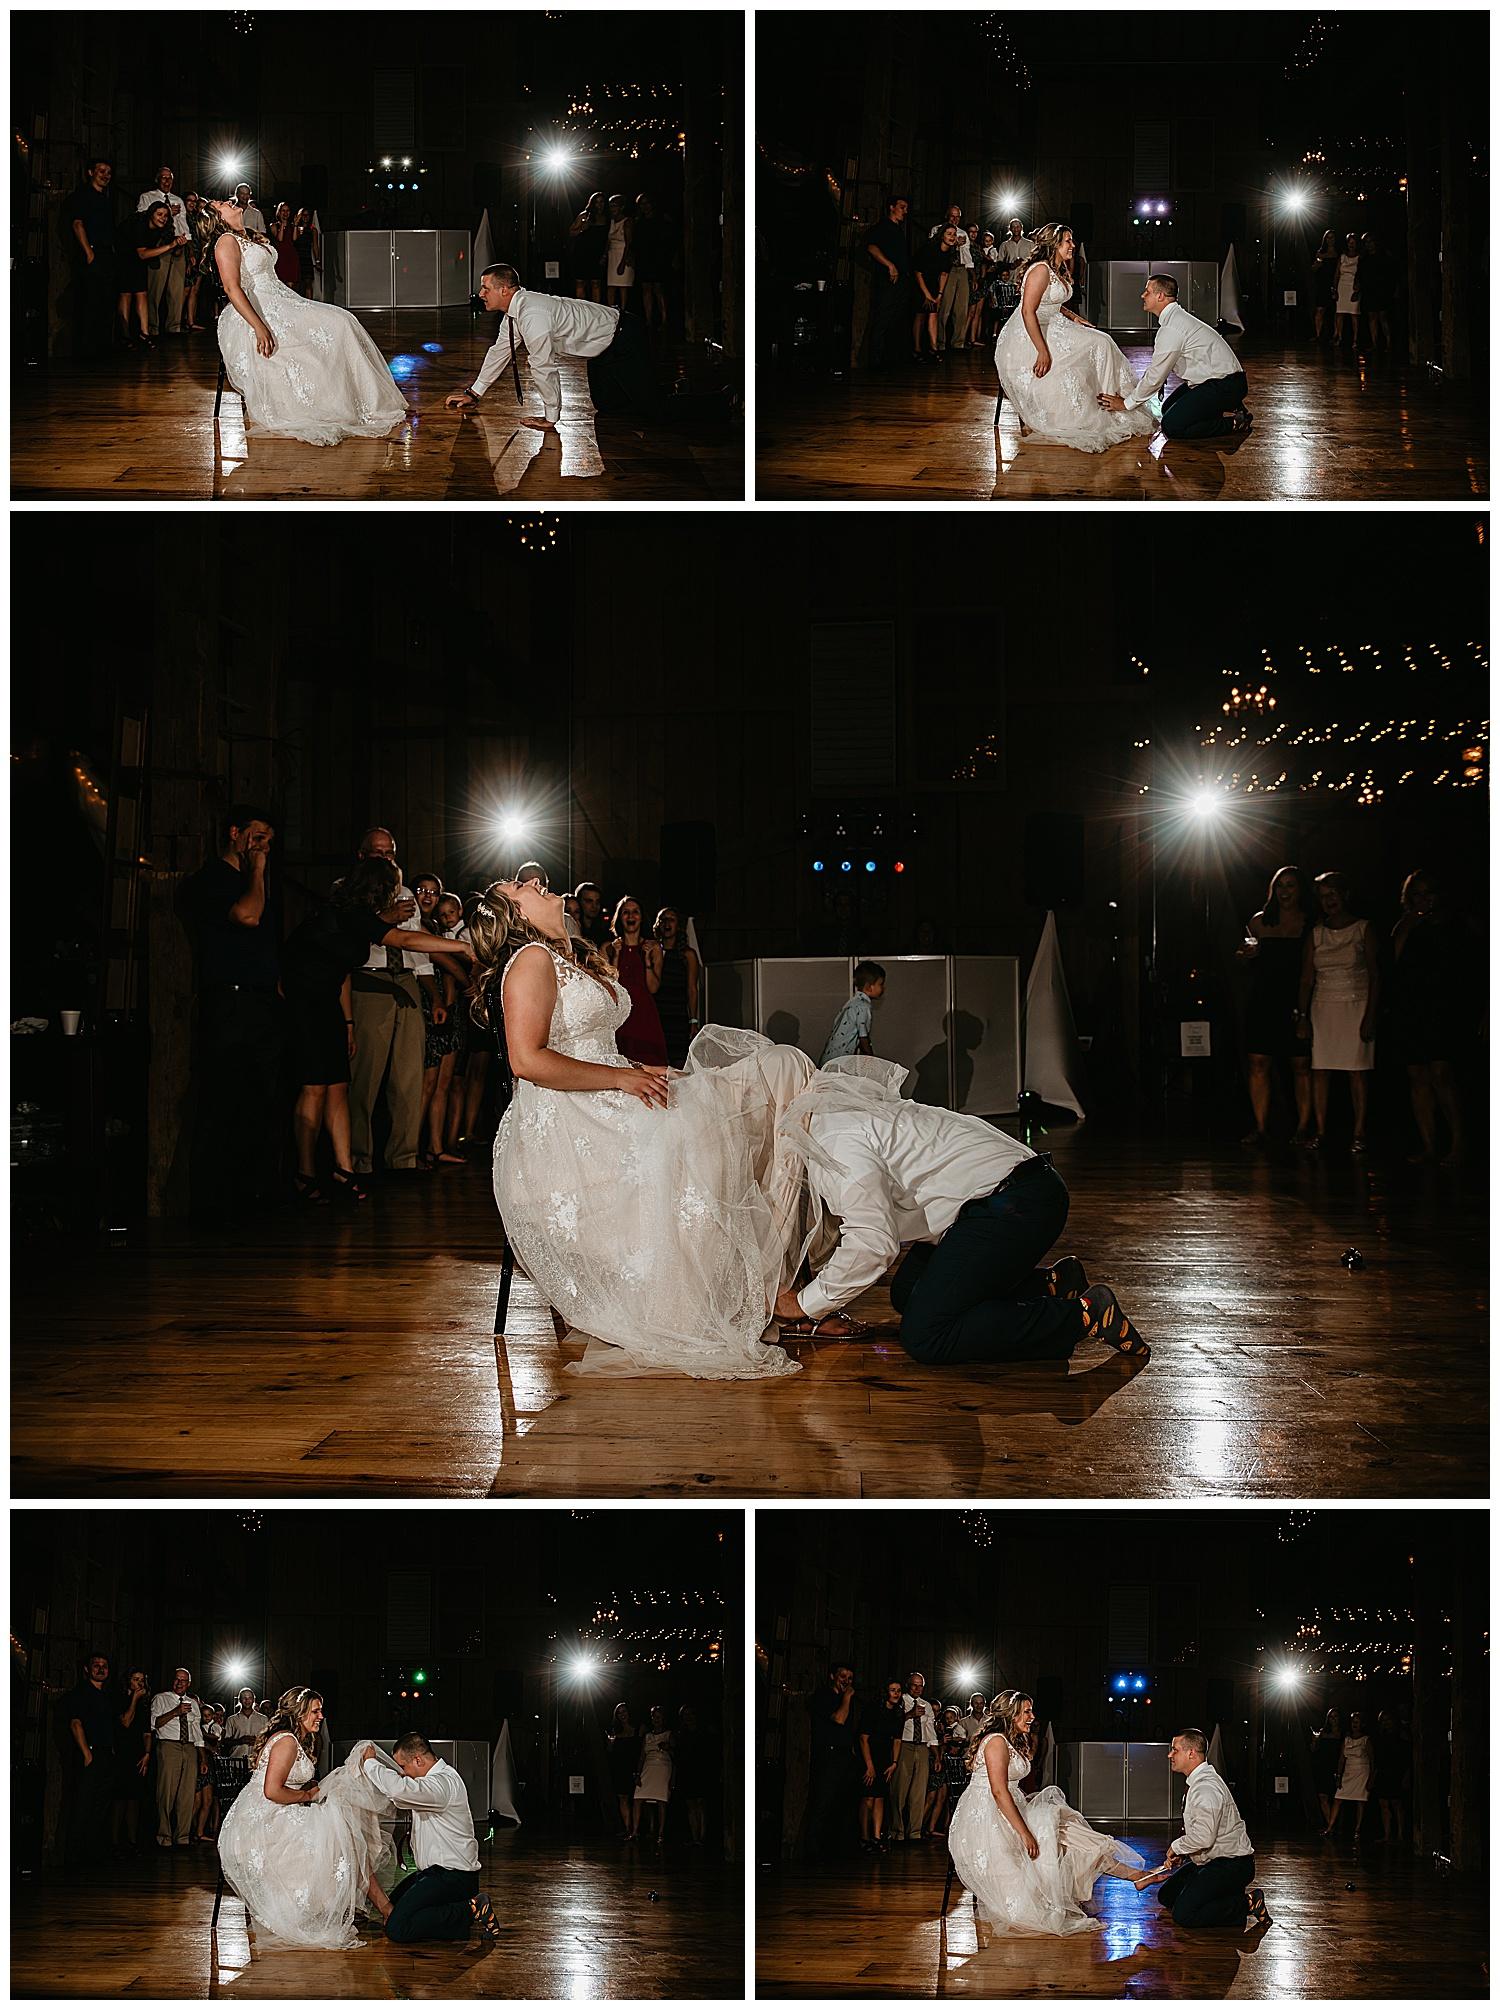 NEPA-Bloomgsburg-Wedding-Photographer-at-The-Barn-at-Greystone-Farms-Watsontown-PA_0111.jpg